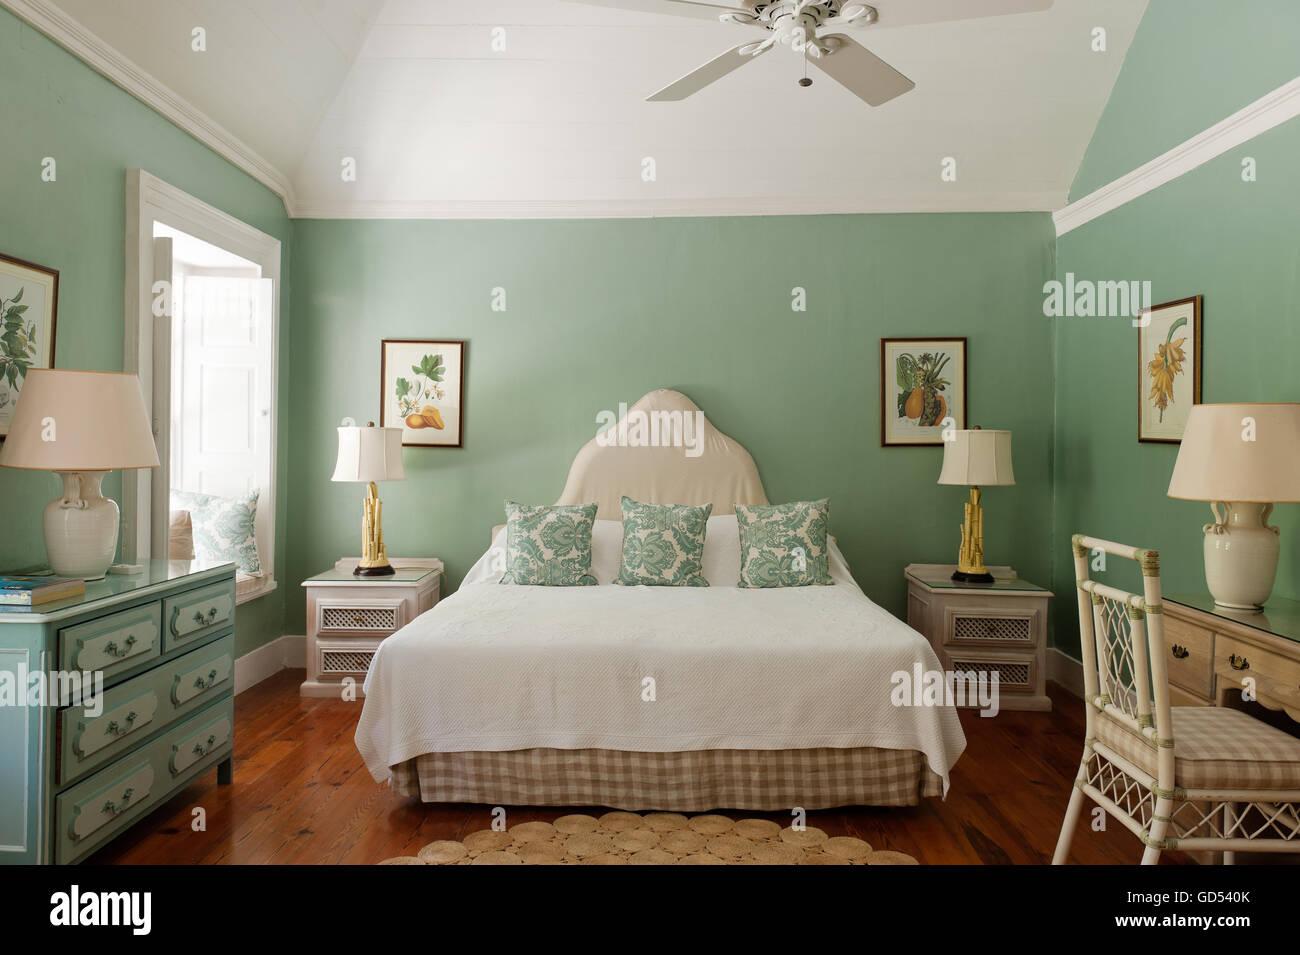 Chambre Vert Pastel | Chambre Vert Pastel Luxe Awesome Chambre Verte ...